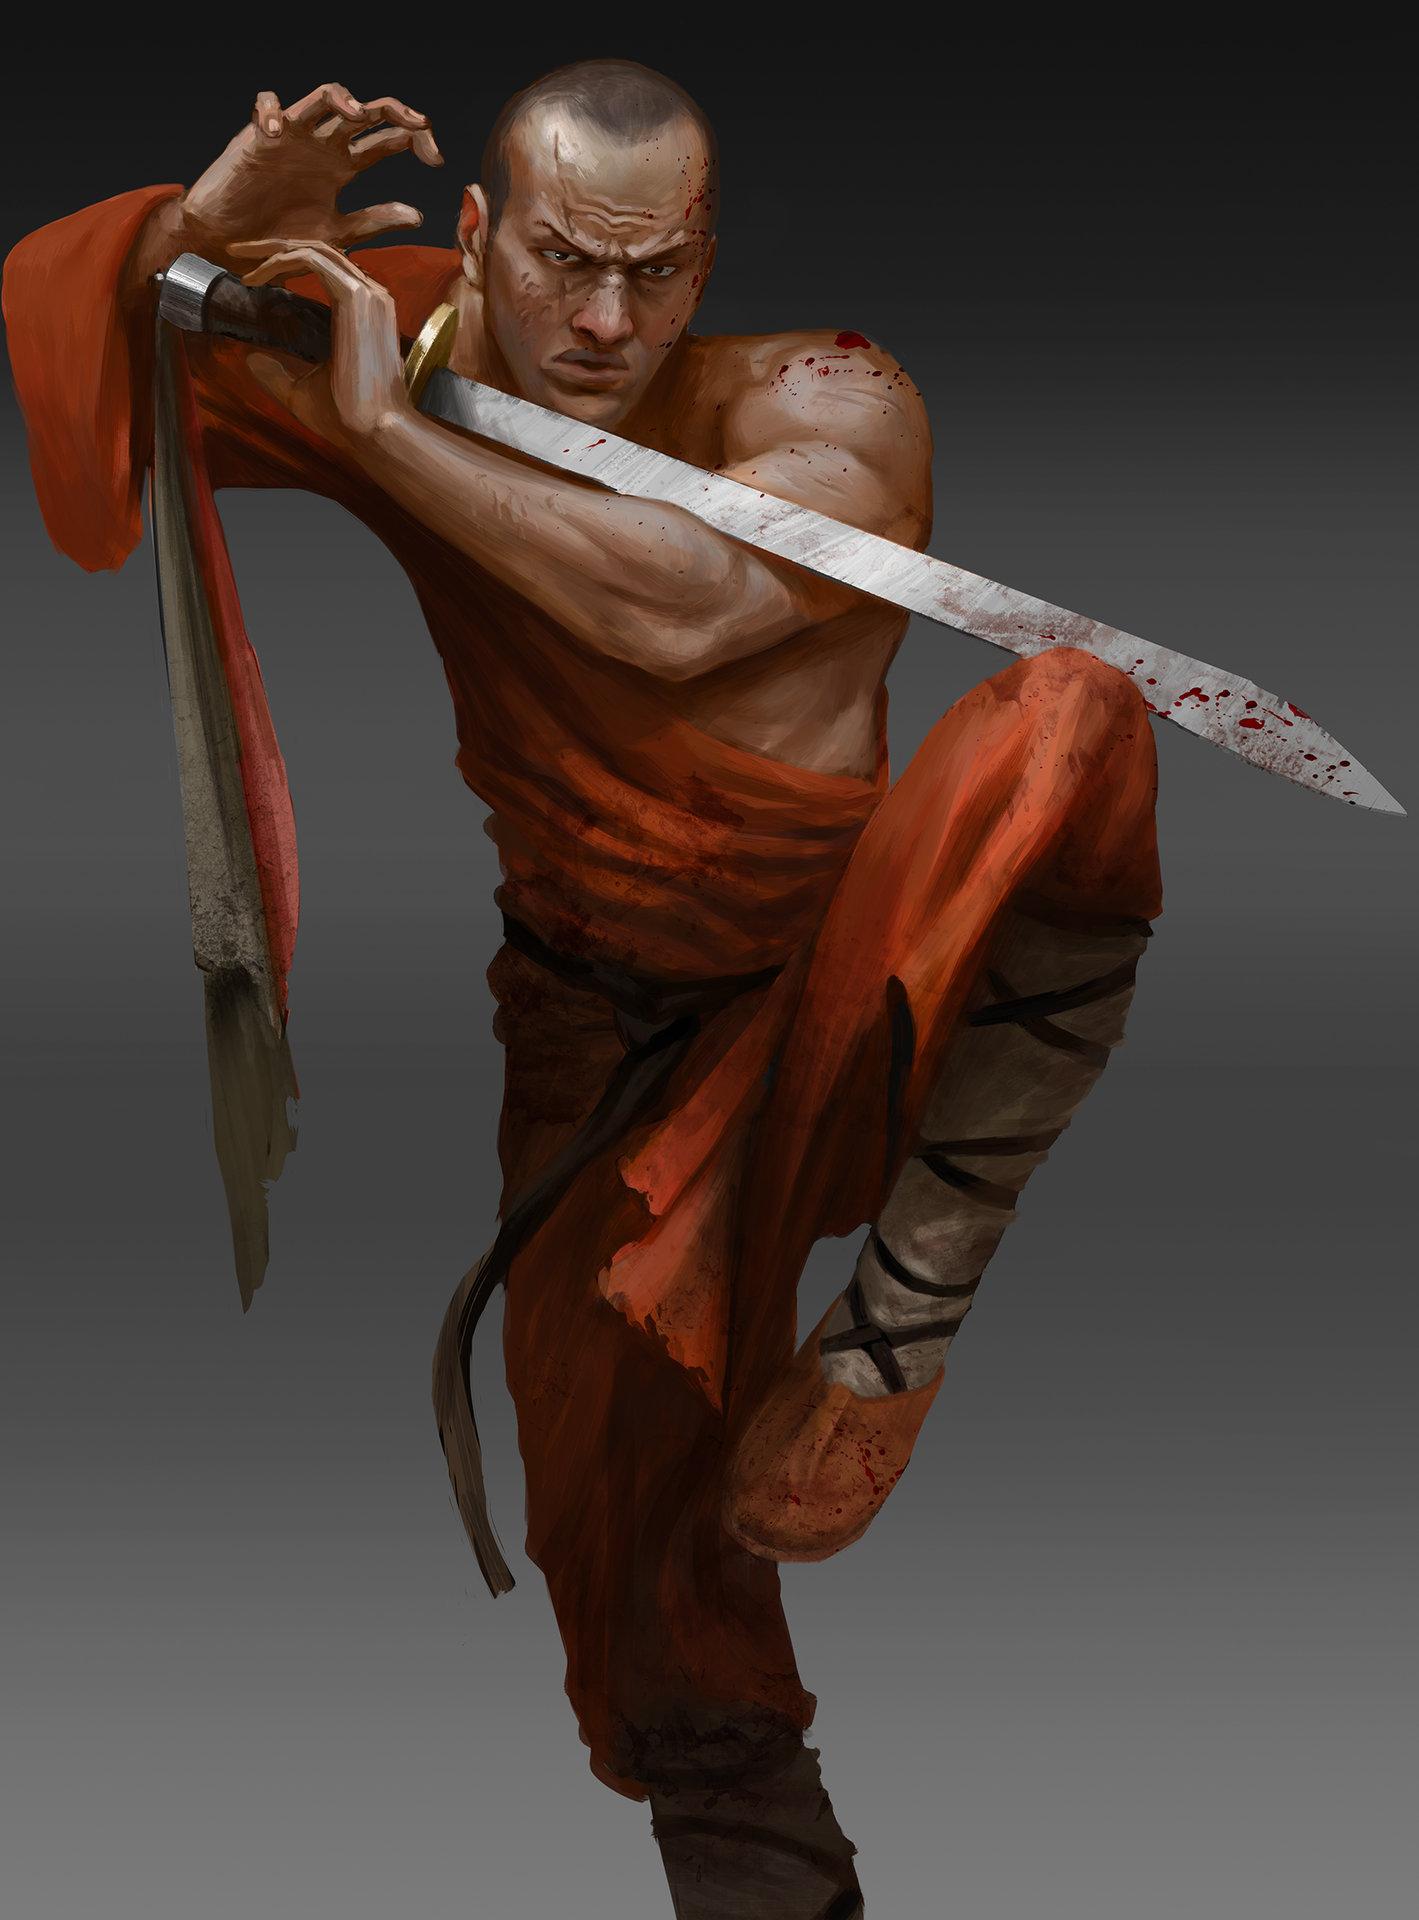 Roberto robert shaolin protector